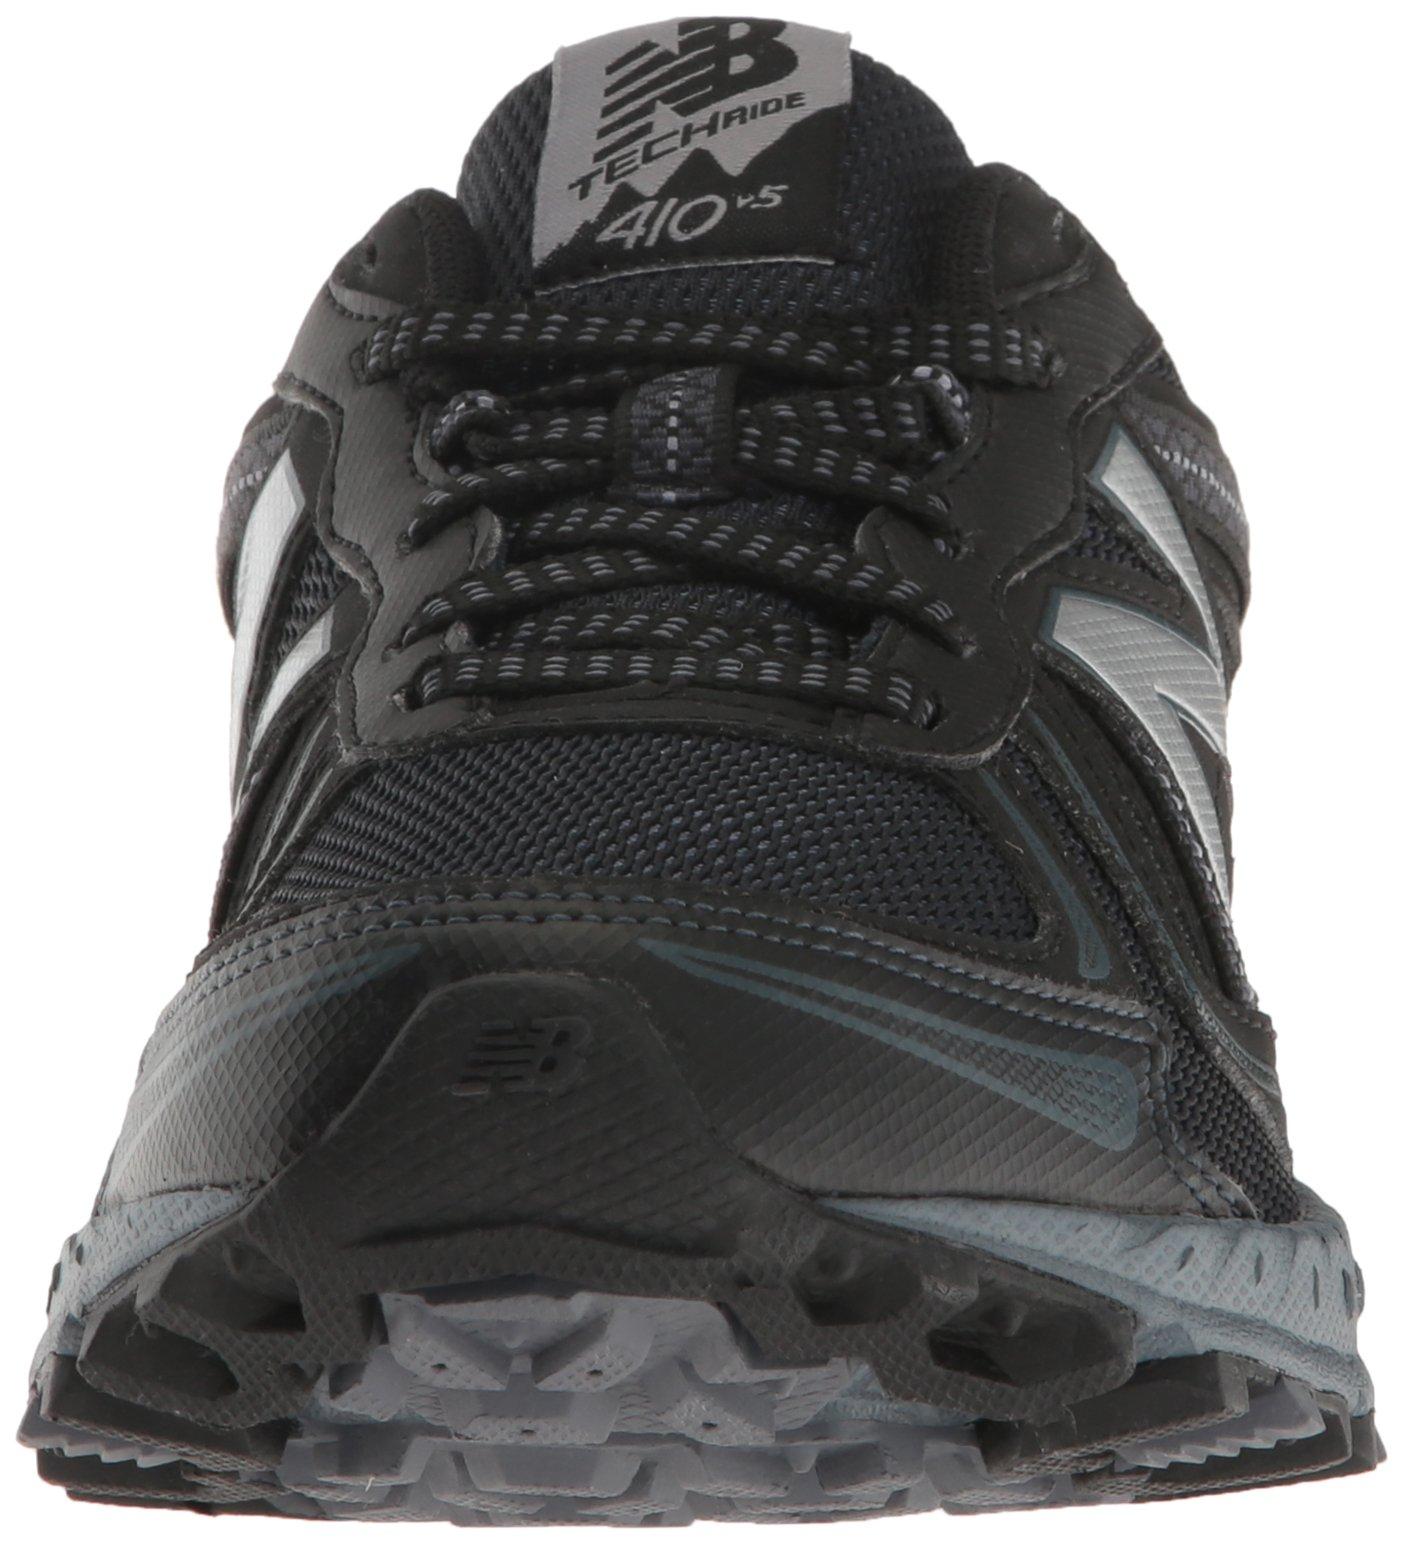 New Balance Men's MT410v5 Cushioning Trail Running Shoe, Black, 7 D US by New Balance (Image #4)